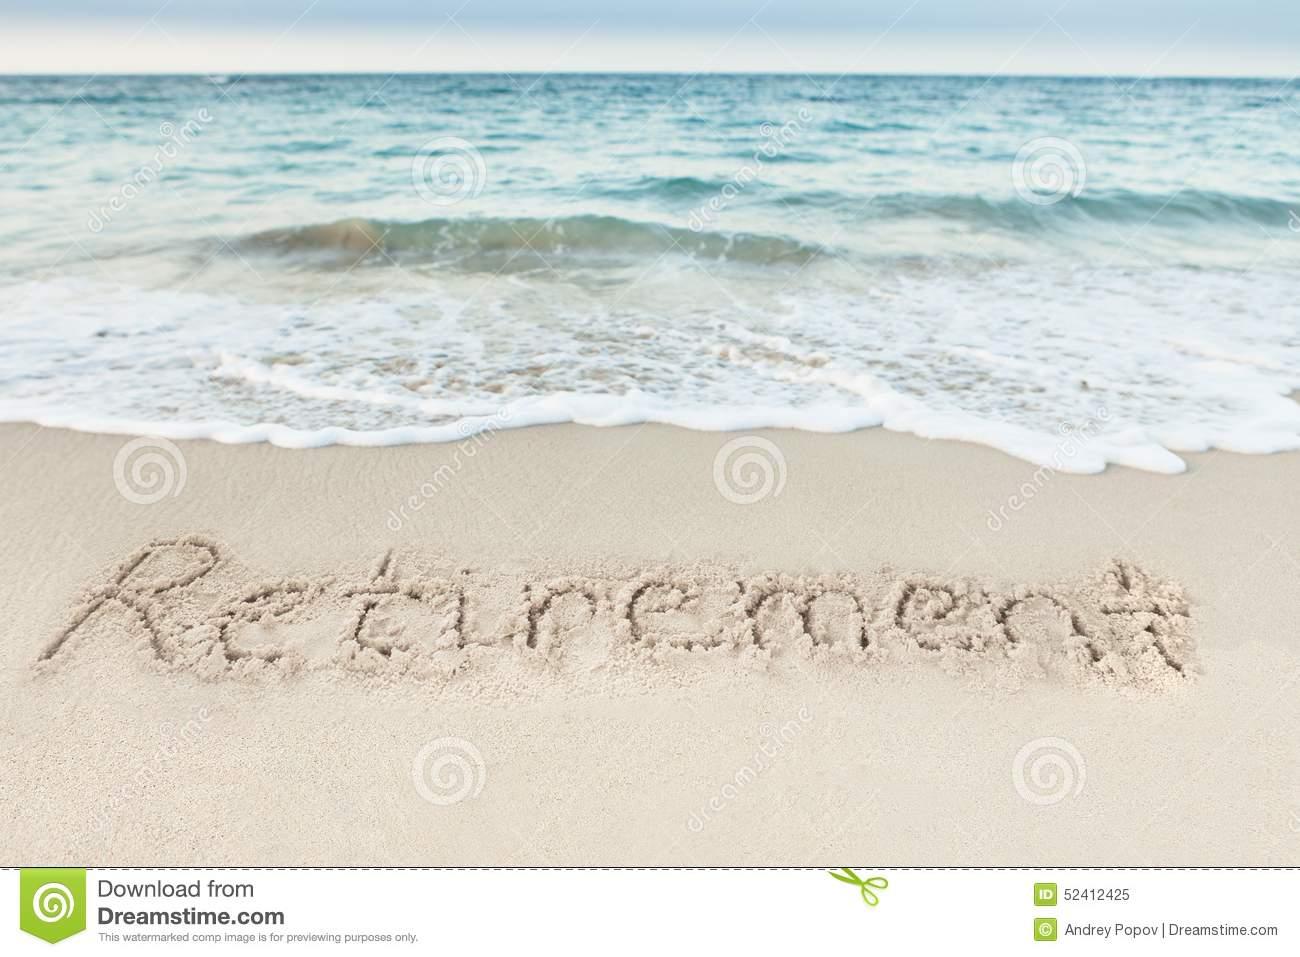 retirement-written-sand-sea-beach-52412425